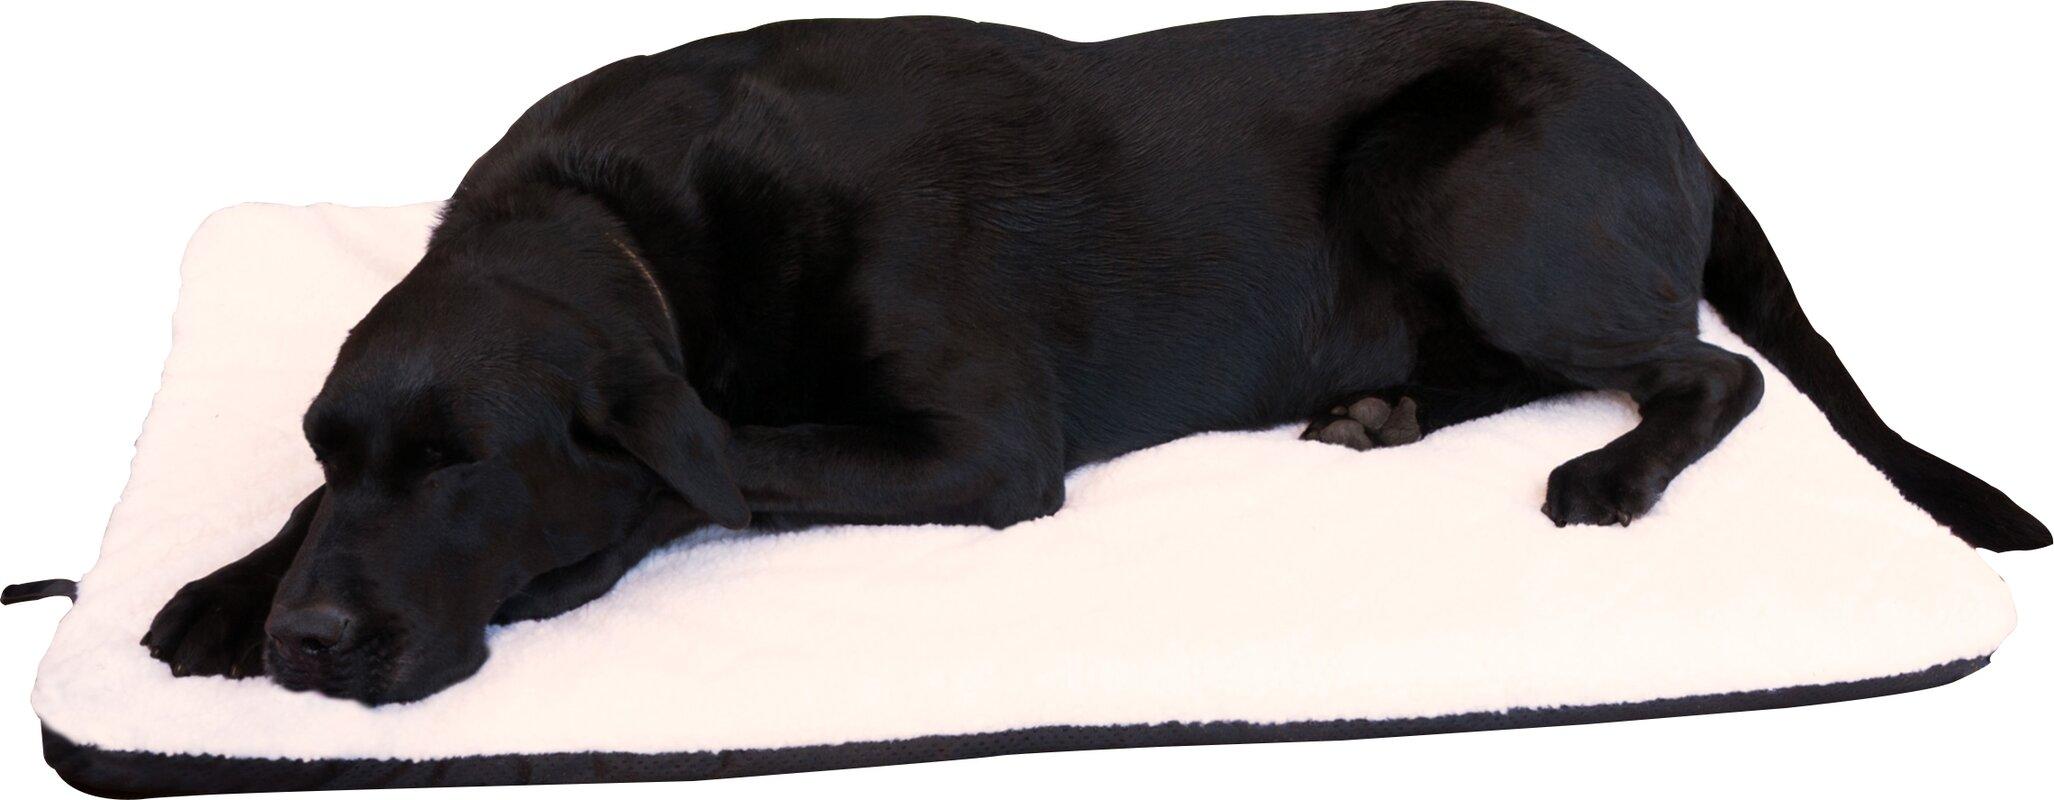 pet tucker crate plush murphy mat reviews orthopedic billy fur pdp